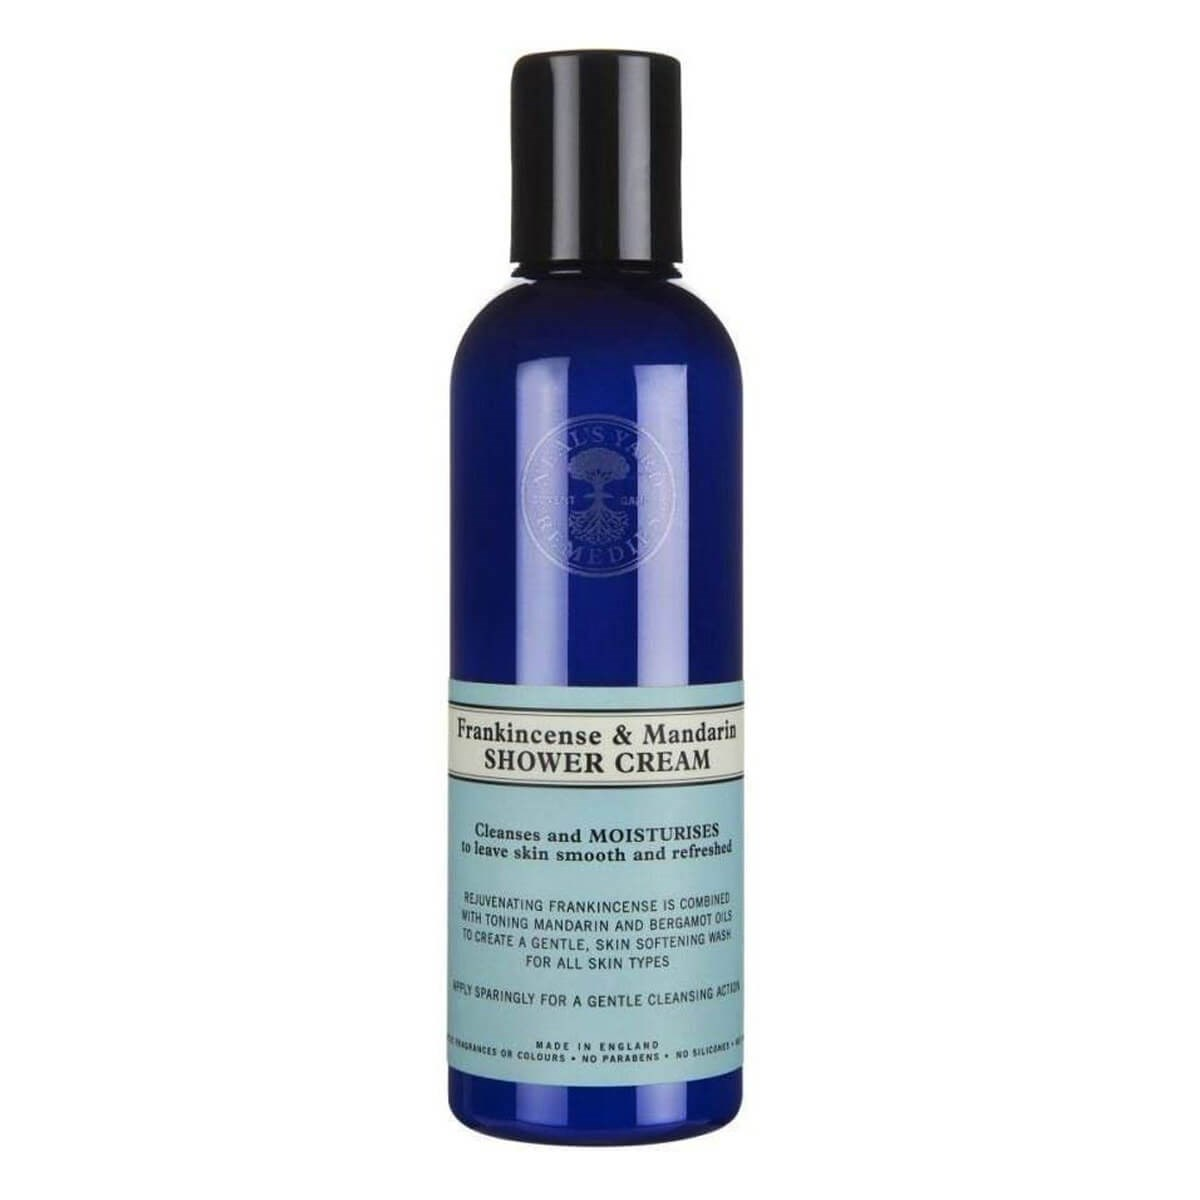 Neal's Yard Remedies Frankincense & Mandarin Shower Cream